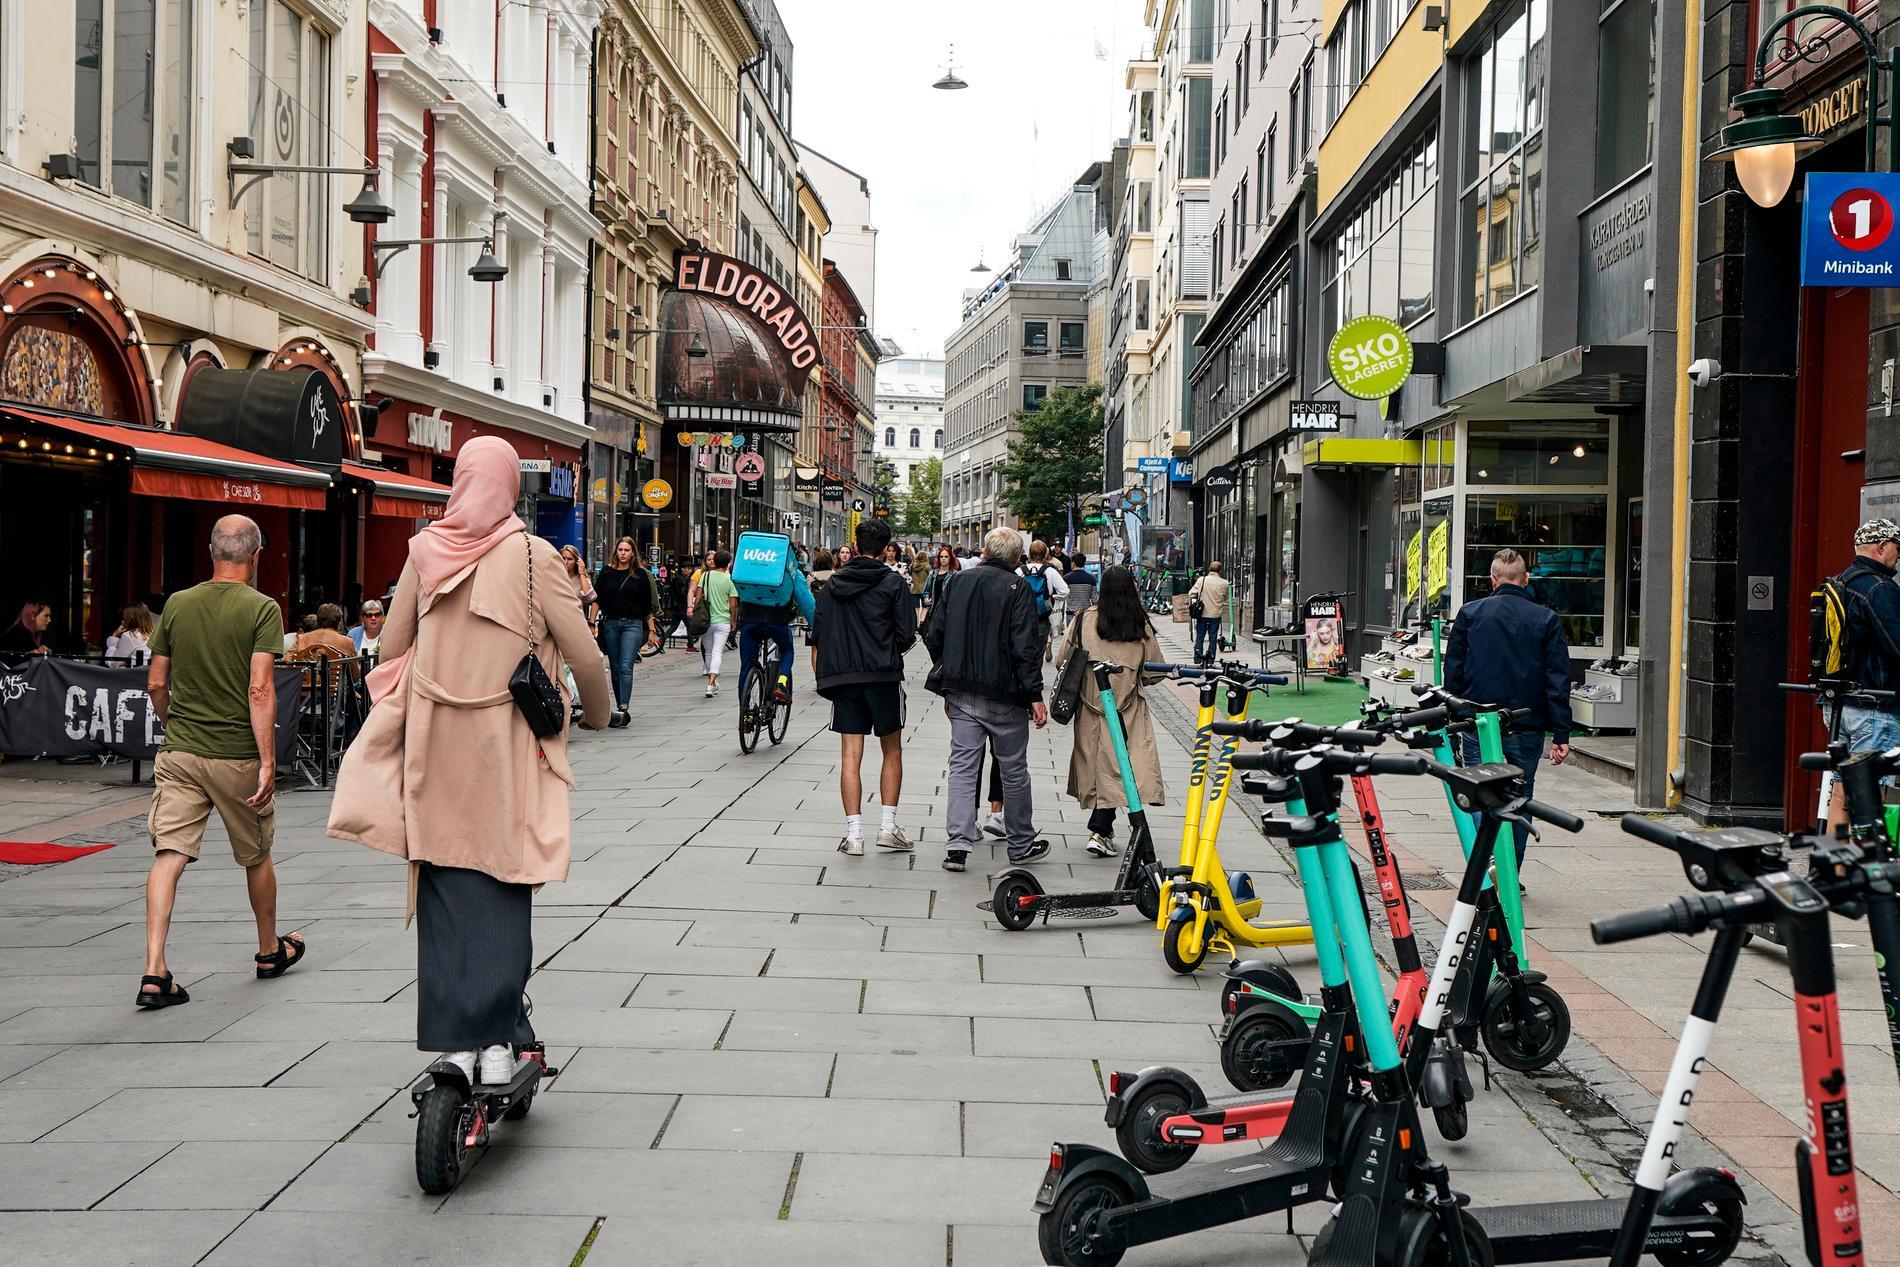 Coronasmittan ökar snabbt i Norges huvudstad Oslo. Arkivbild.